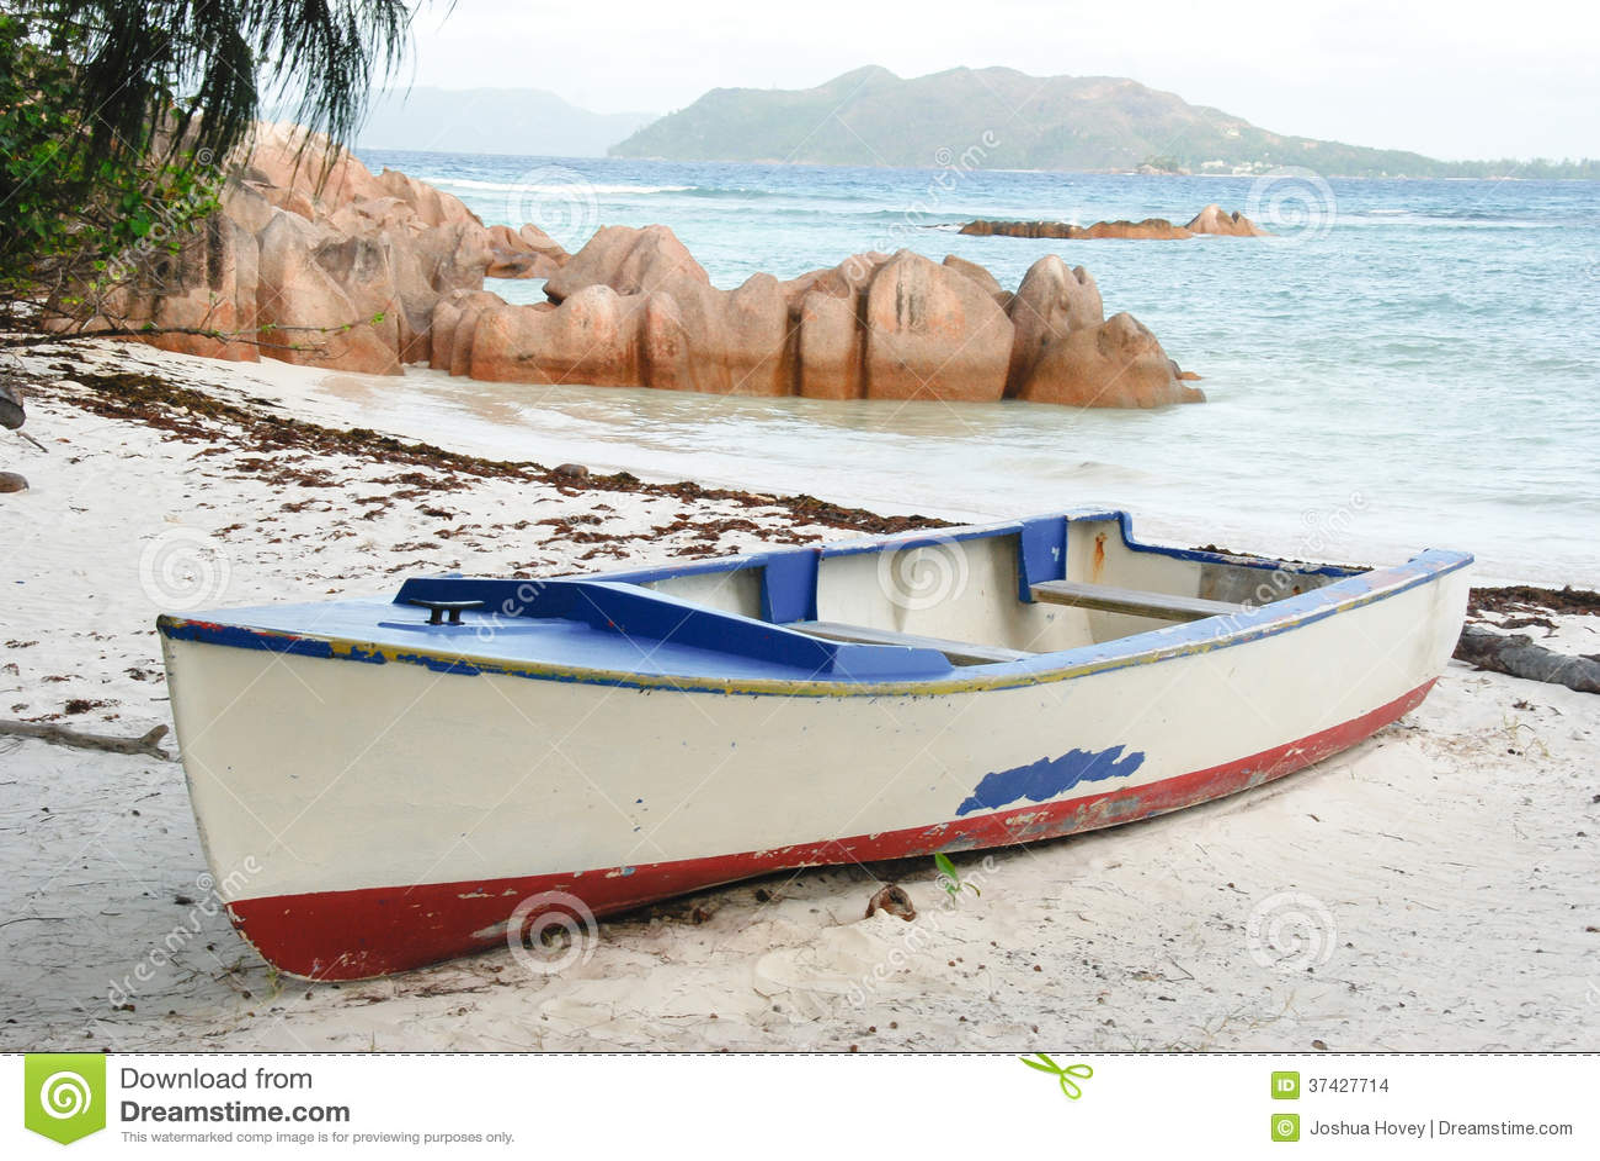 Best Carribean Island To Buy A Beach Home